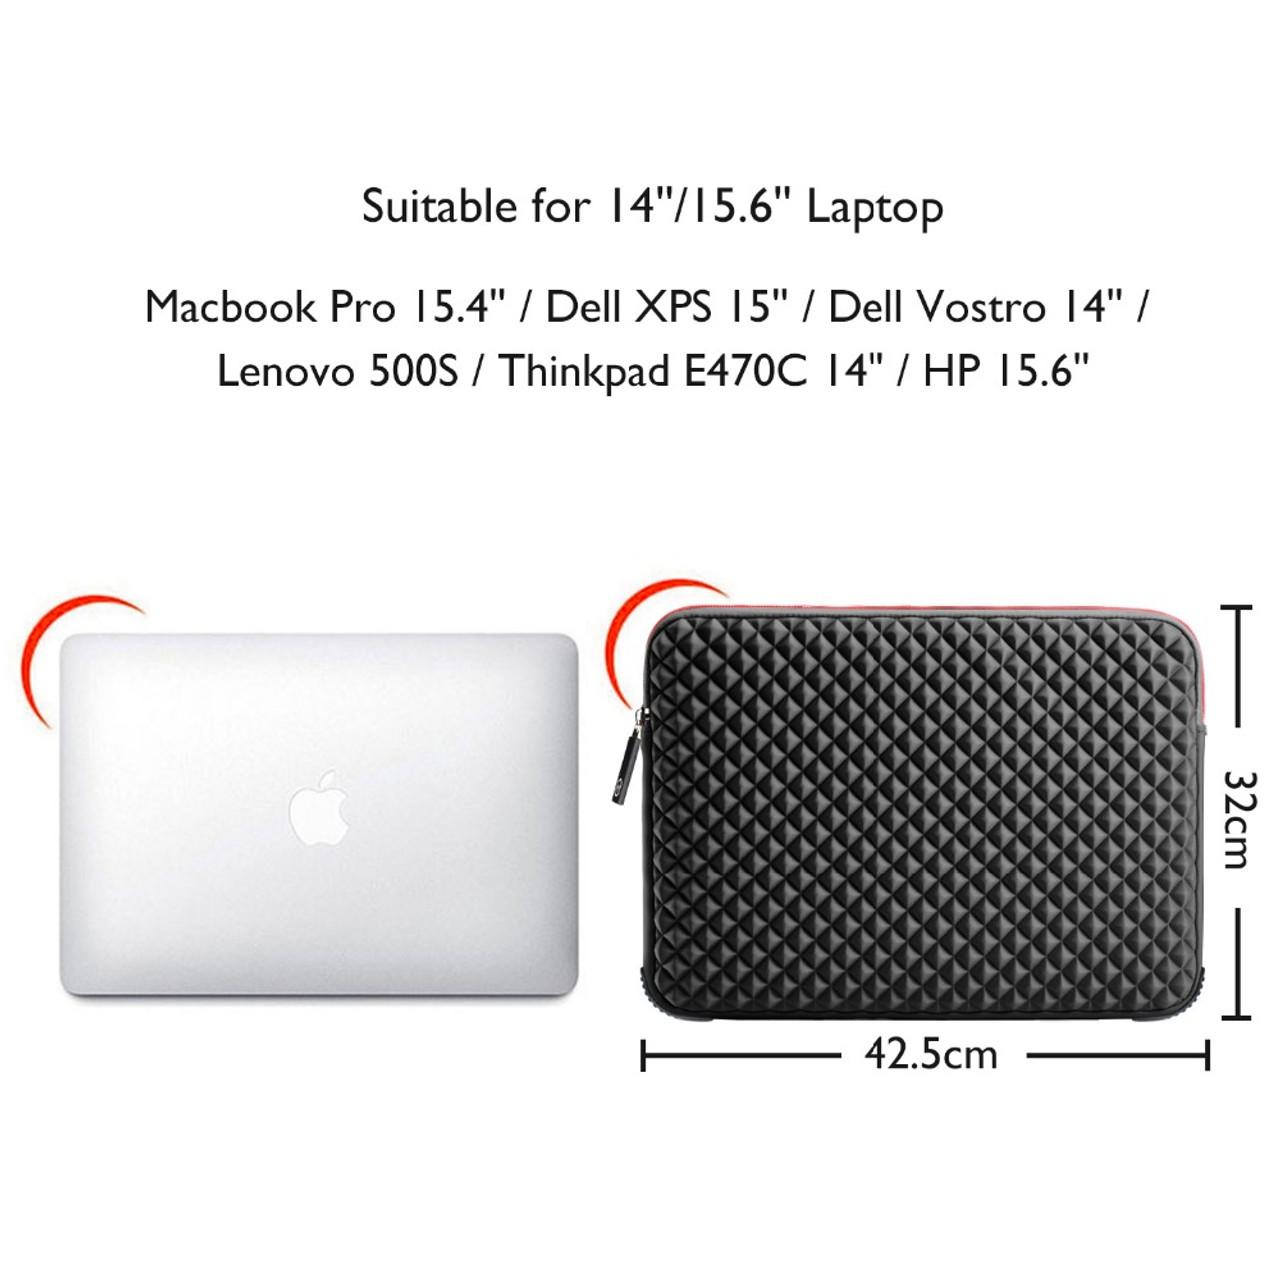 dc5dcd471bc ... Gearmax WIWU 13 13.3 15 15.6 17 17.3 inch Laptop Sleeve Waterproof  Shockproof Black Notebook ...